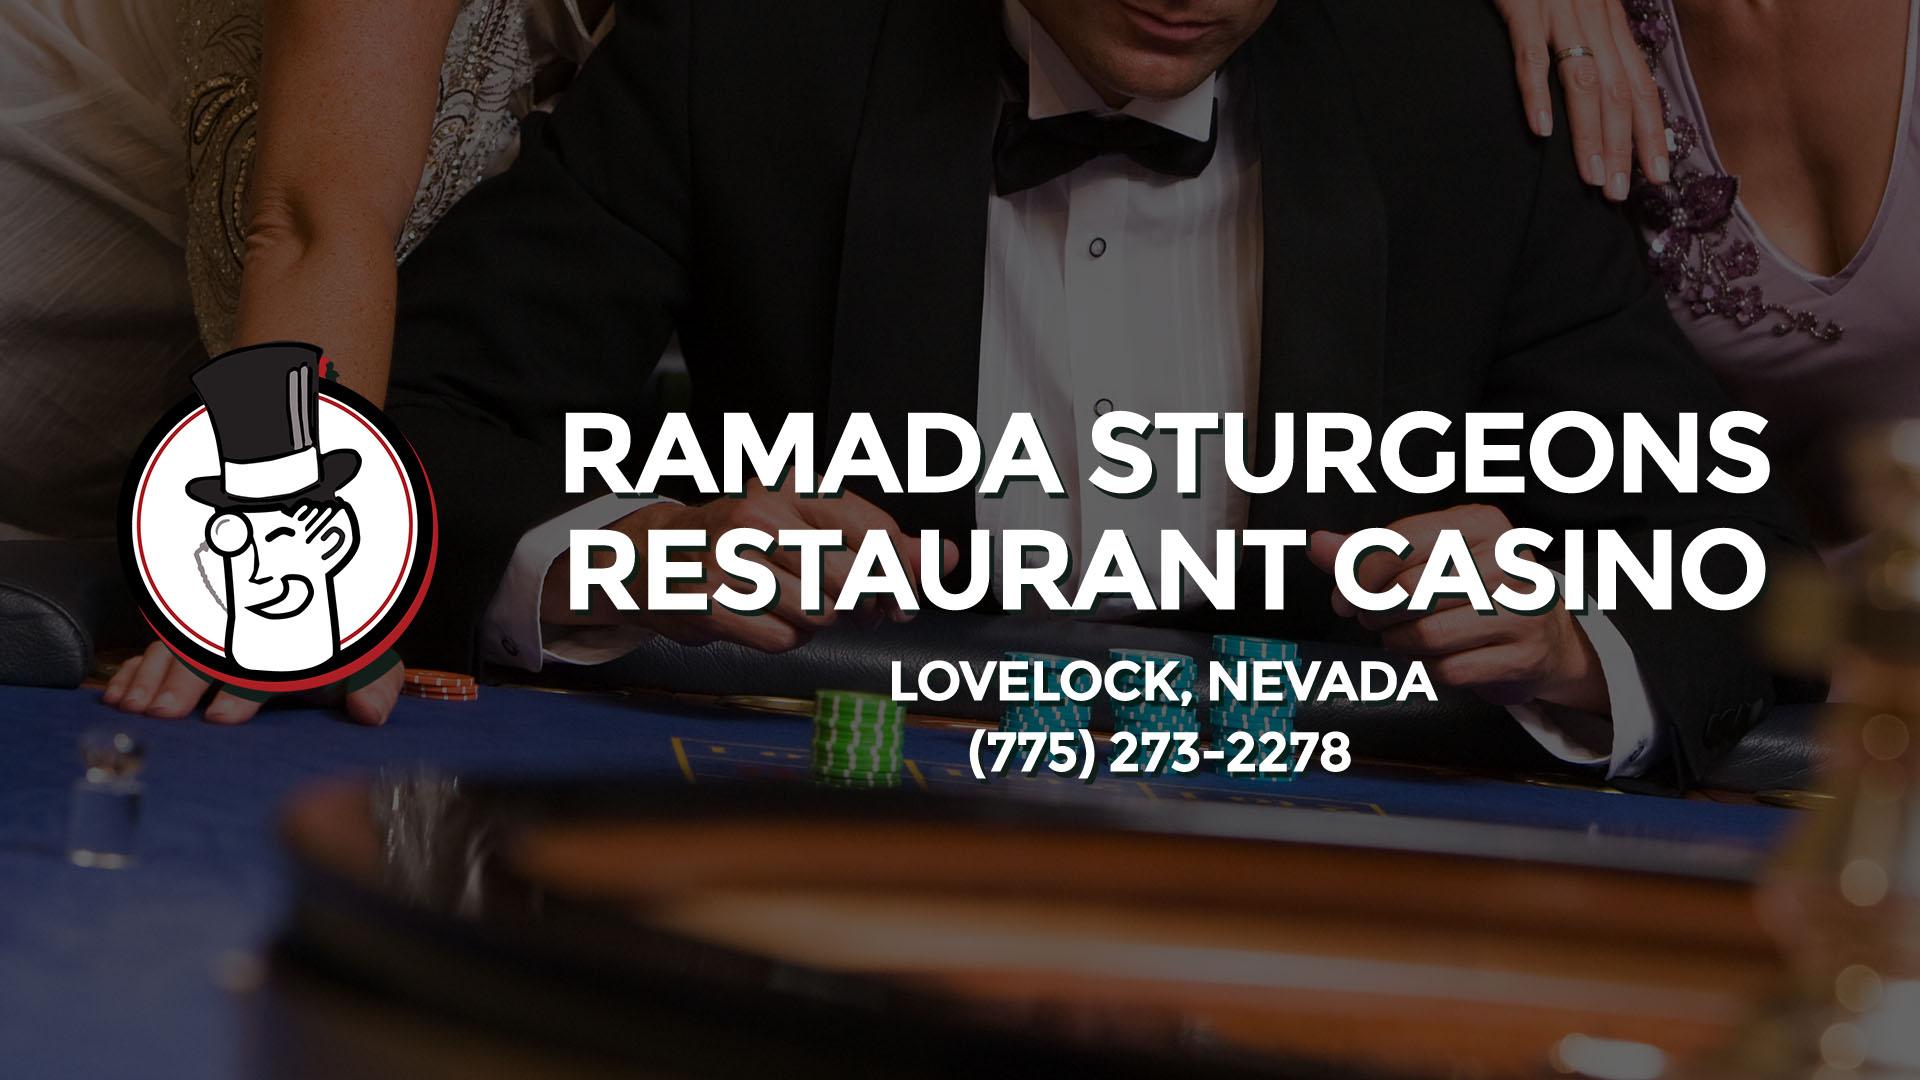 RAMADA STURGEONS RSTRNT CASINO LOVELOCK NV